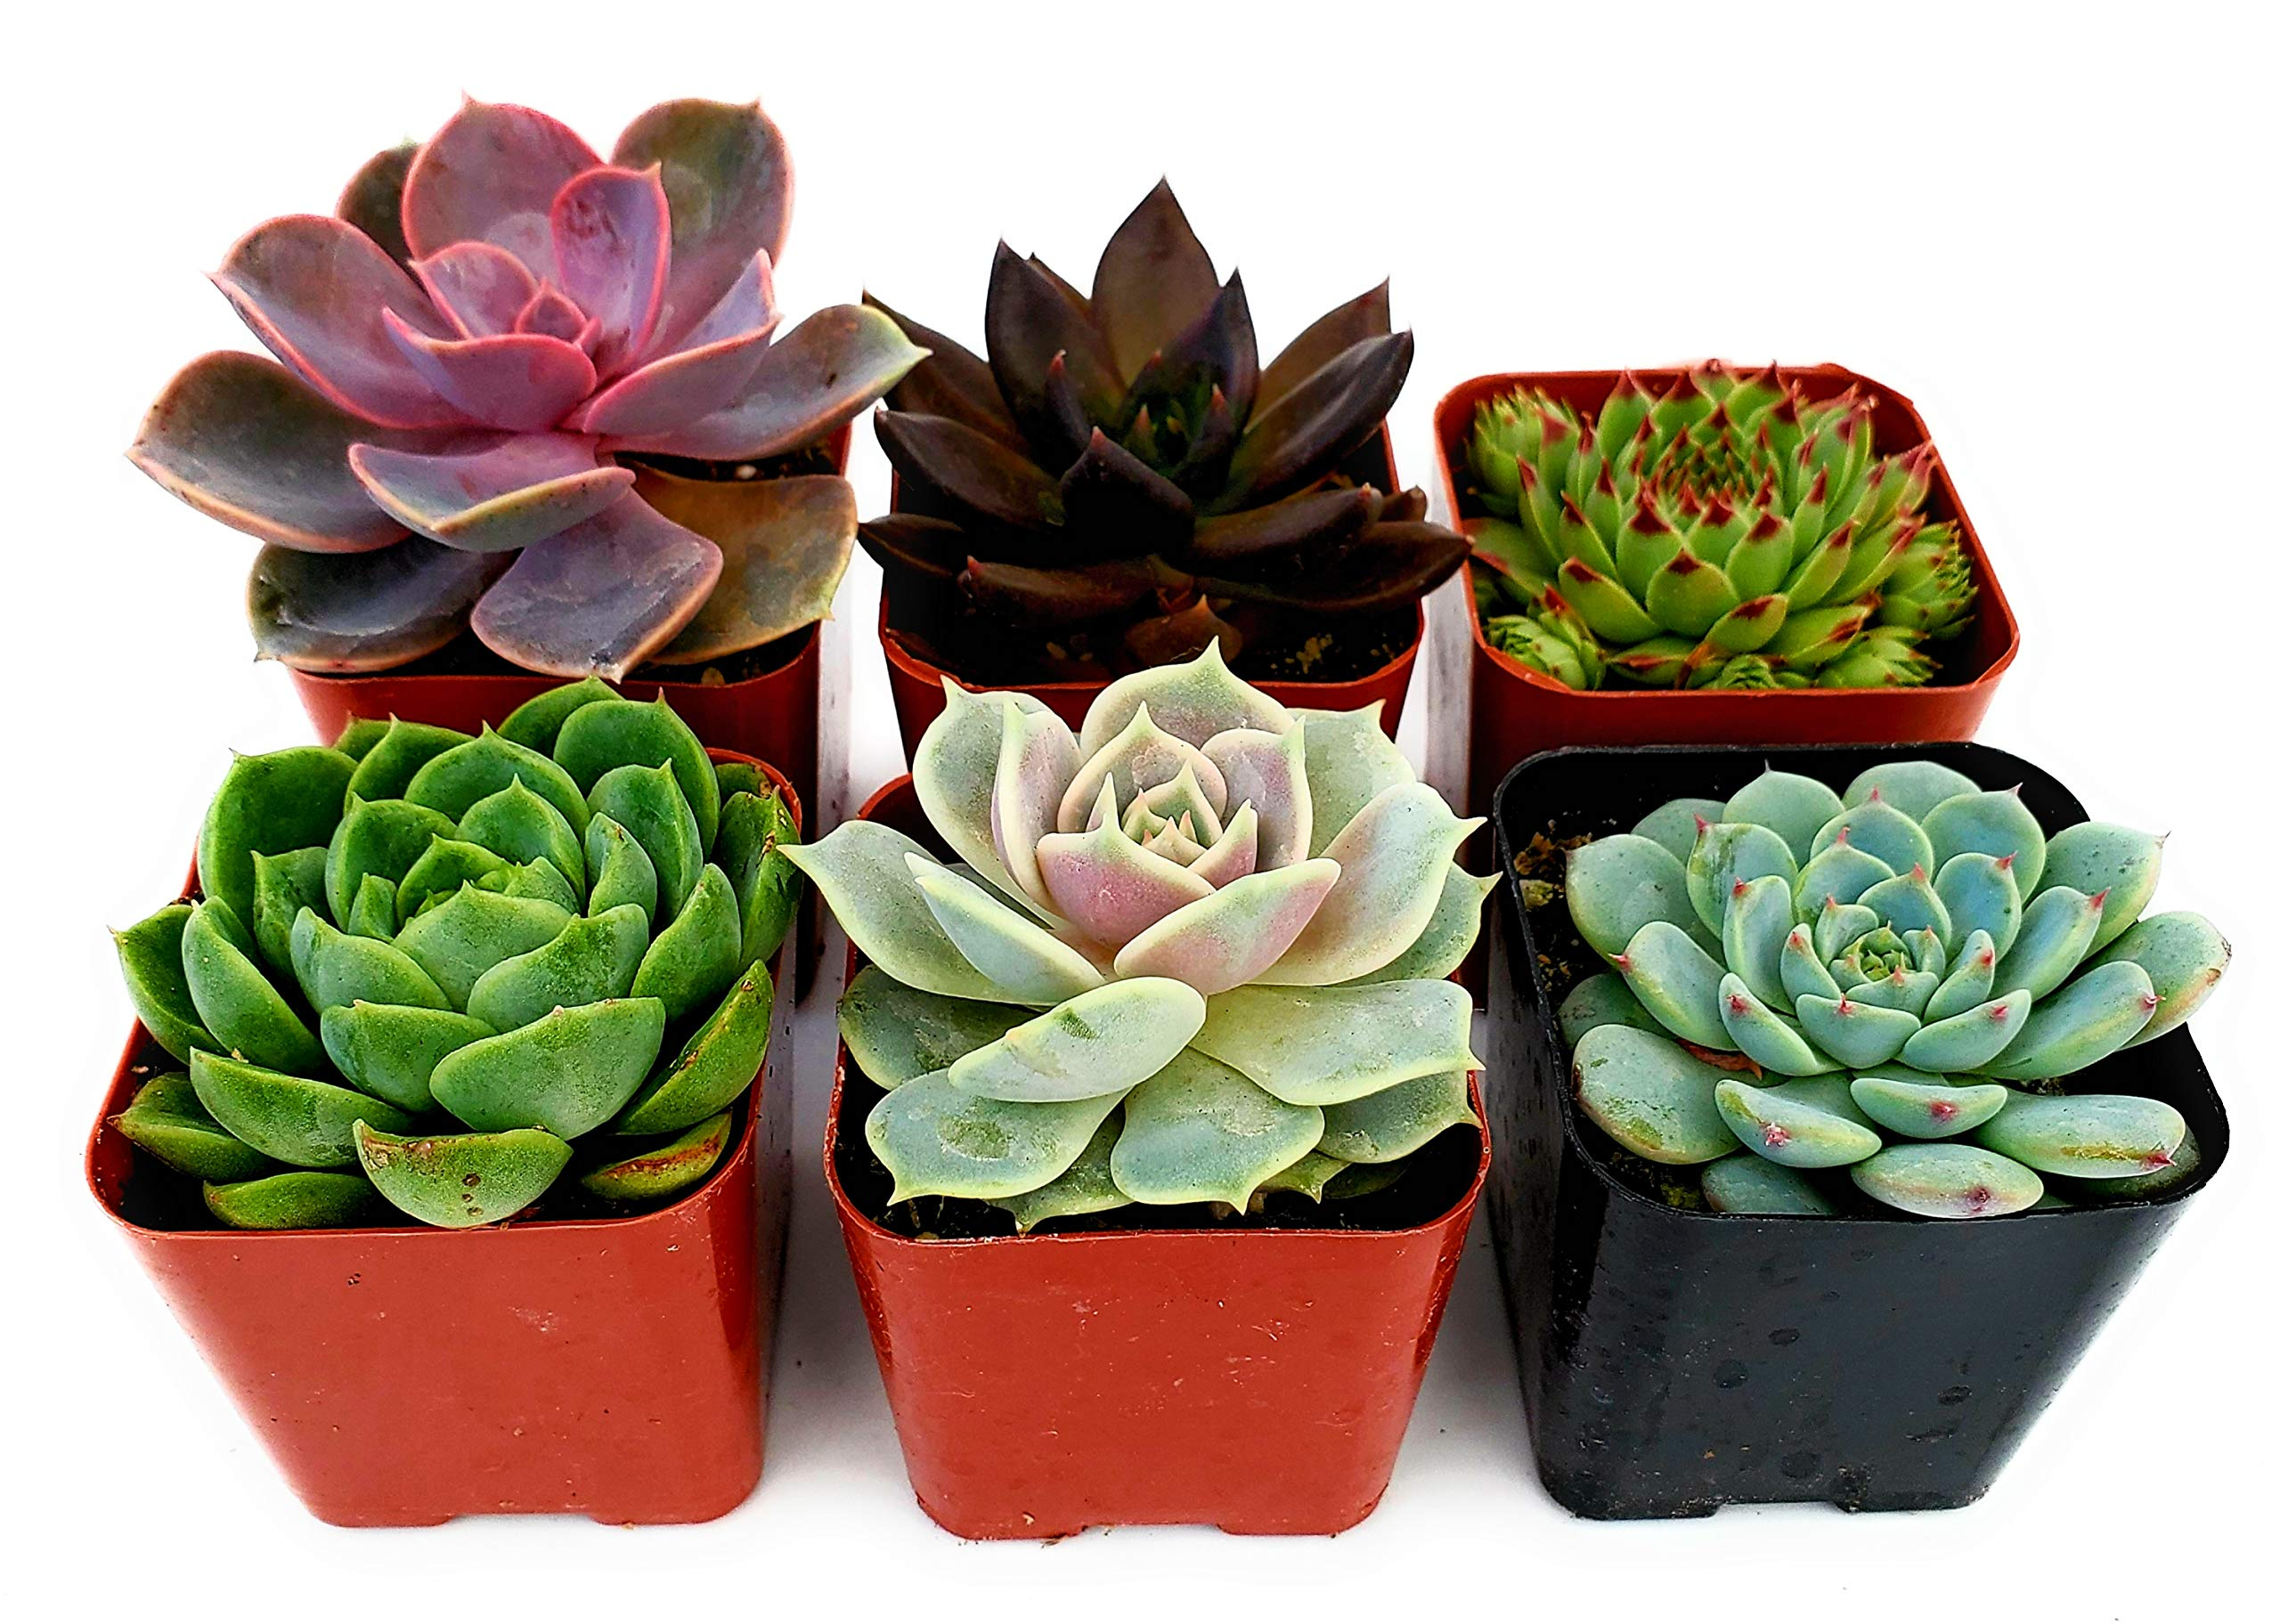 Fat Plants San Diego All Rosette Succulent Plants in 2 Inch Pots (6)